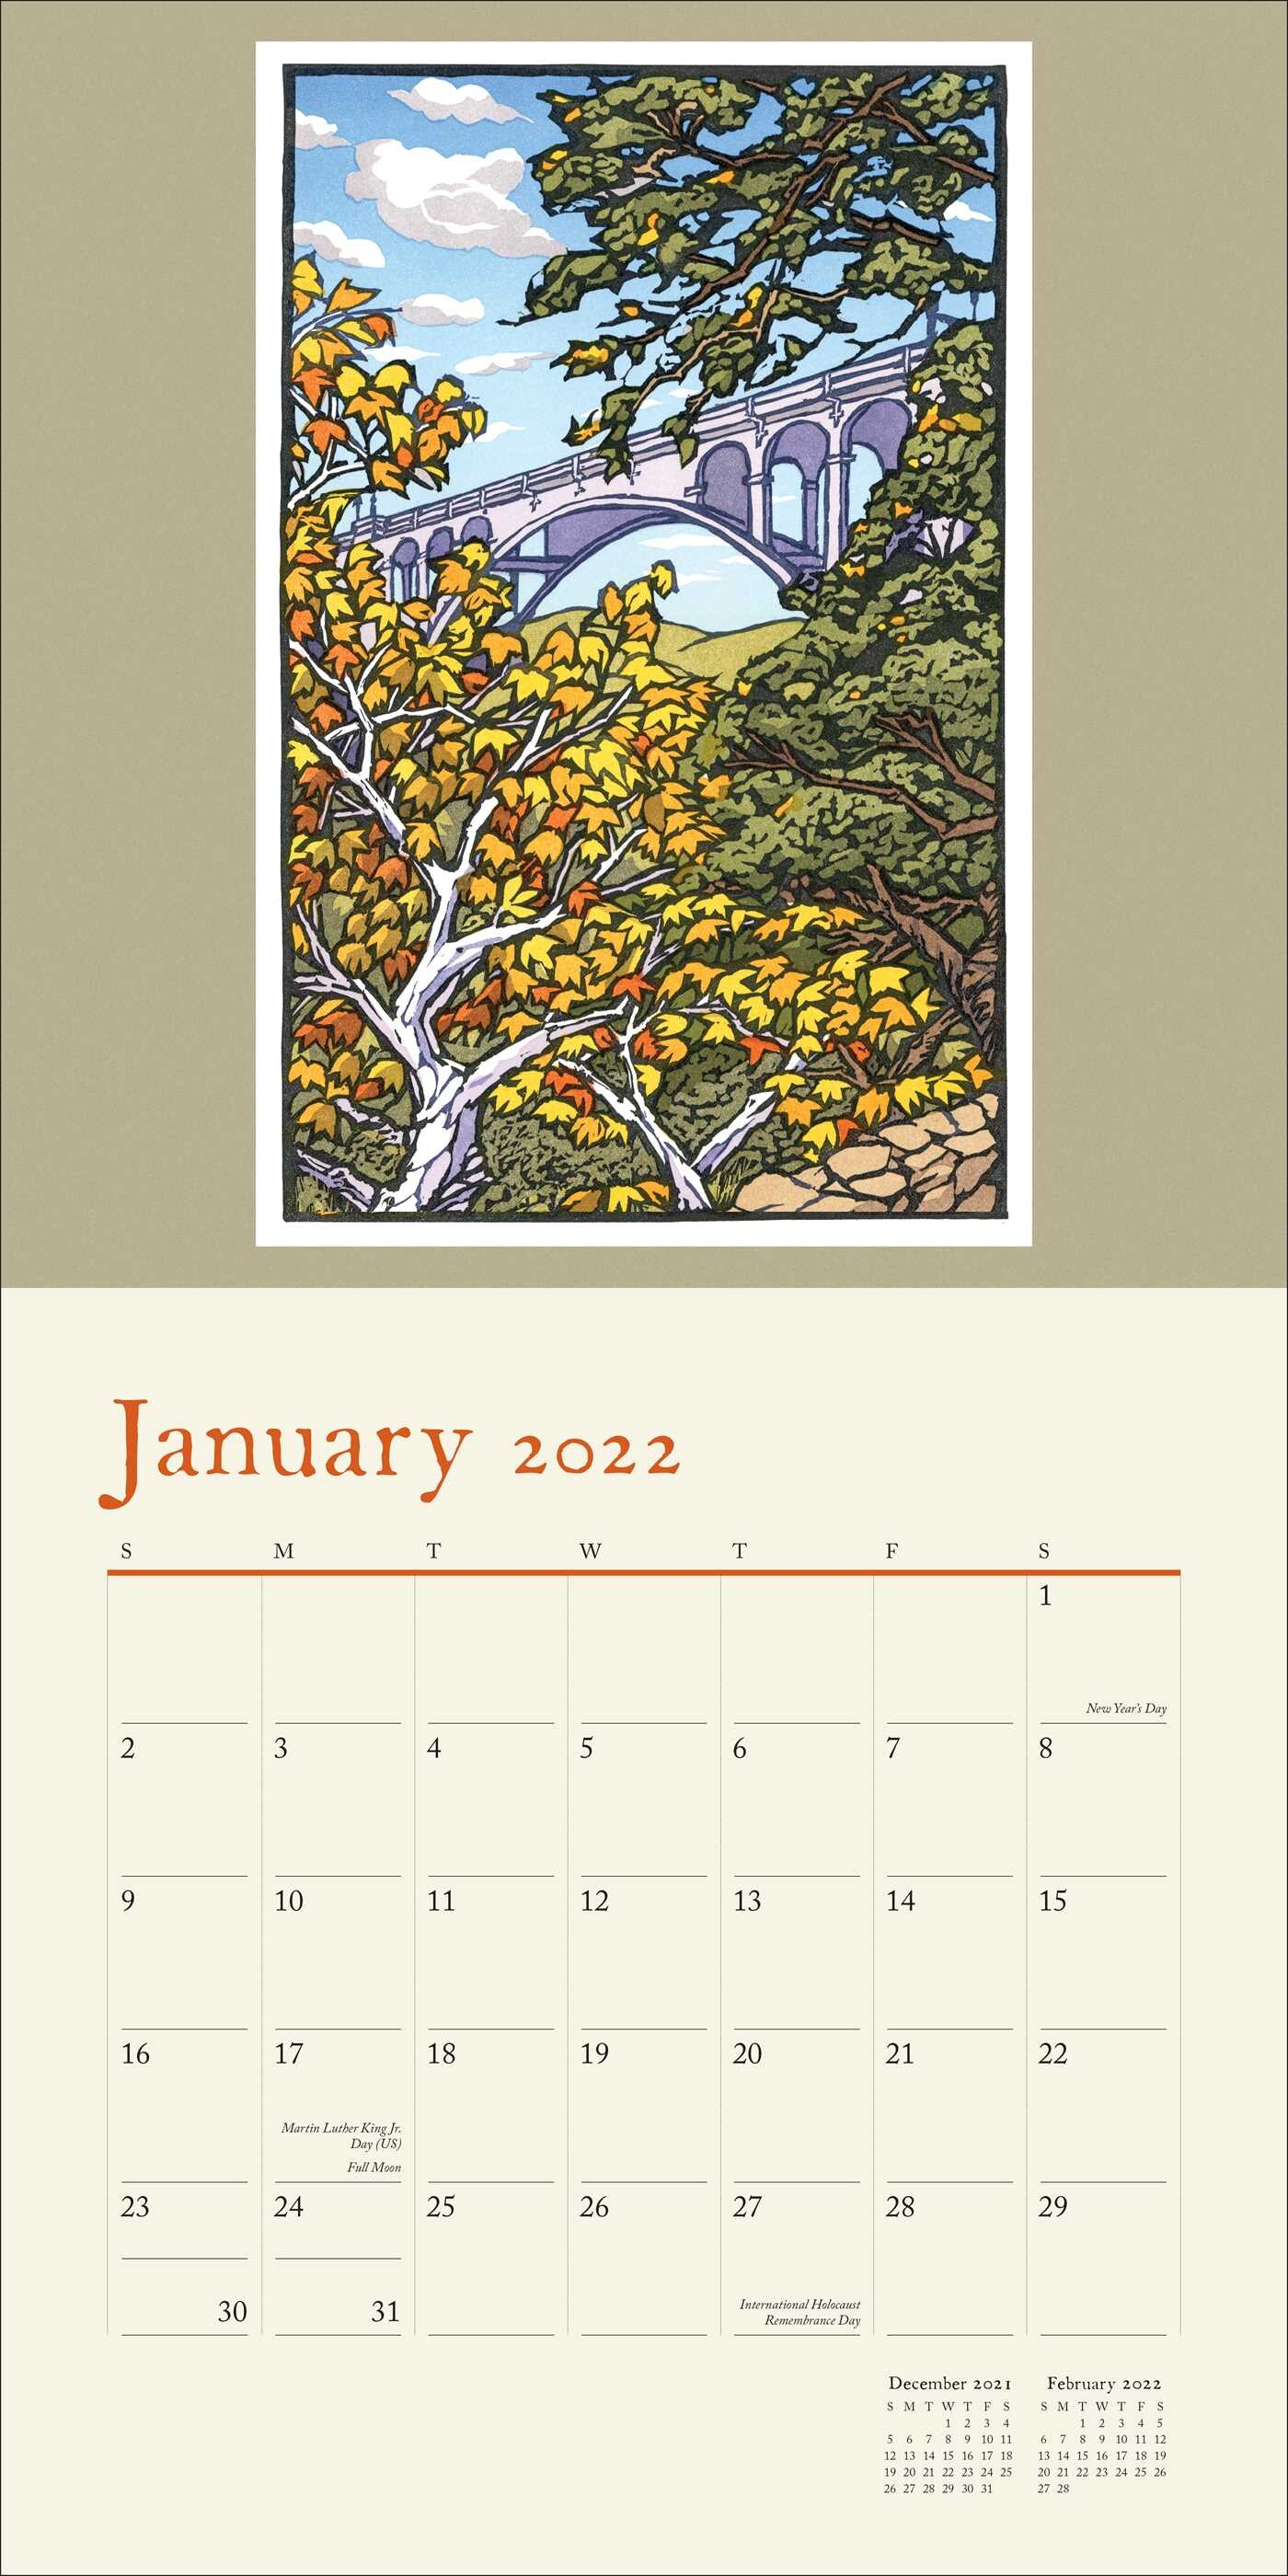 University Of Maryland Calendar 2022.Natural Art Japanese Blockprints 2022 Wall Calendar Book Summary Video Official Publisher Page Simon Schuster